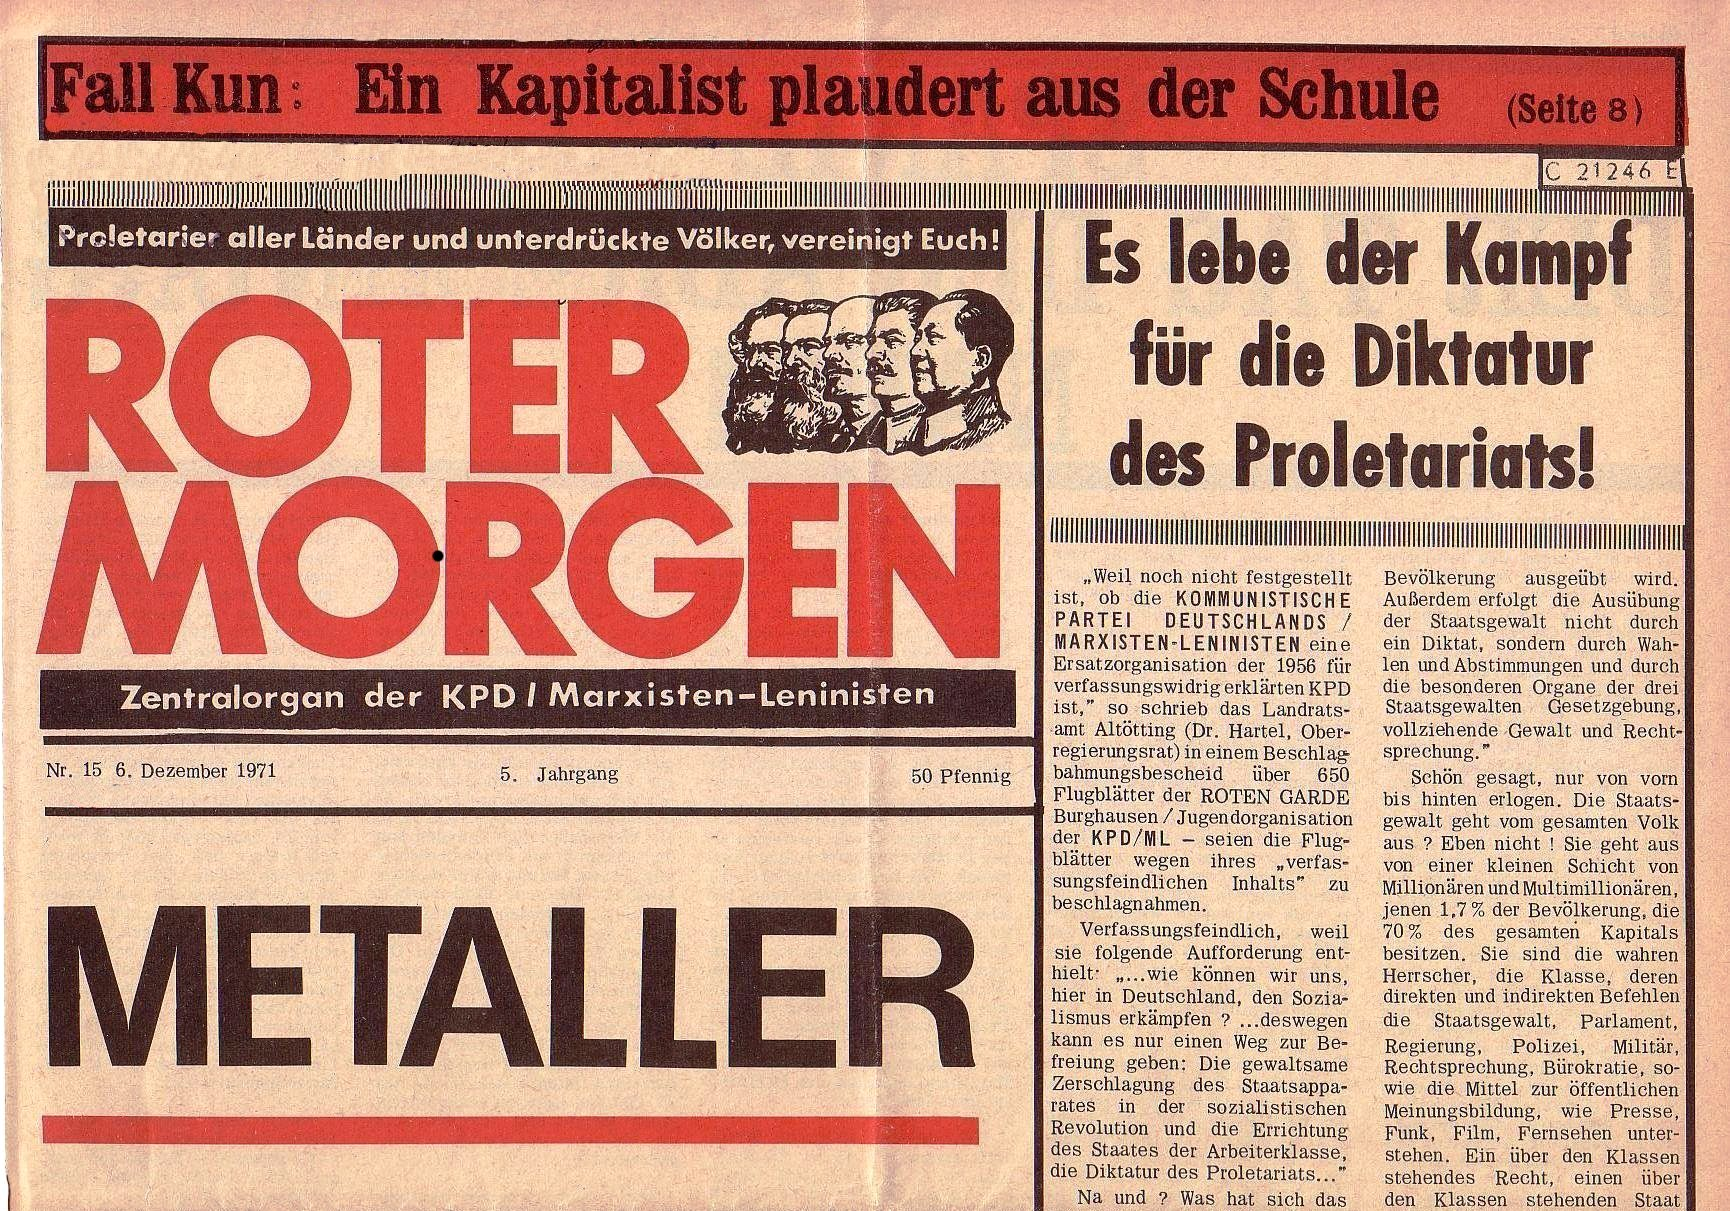 Roter Morgen, 5. Jg., 6. Dezember 1971, Nr. 15, Seite 1a